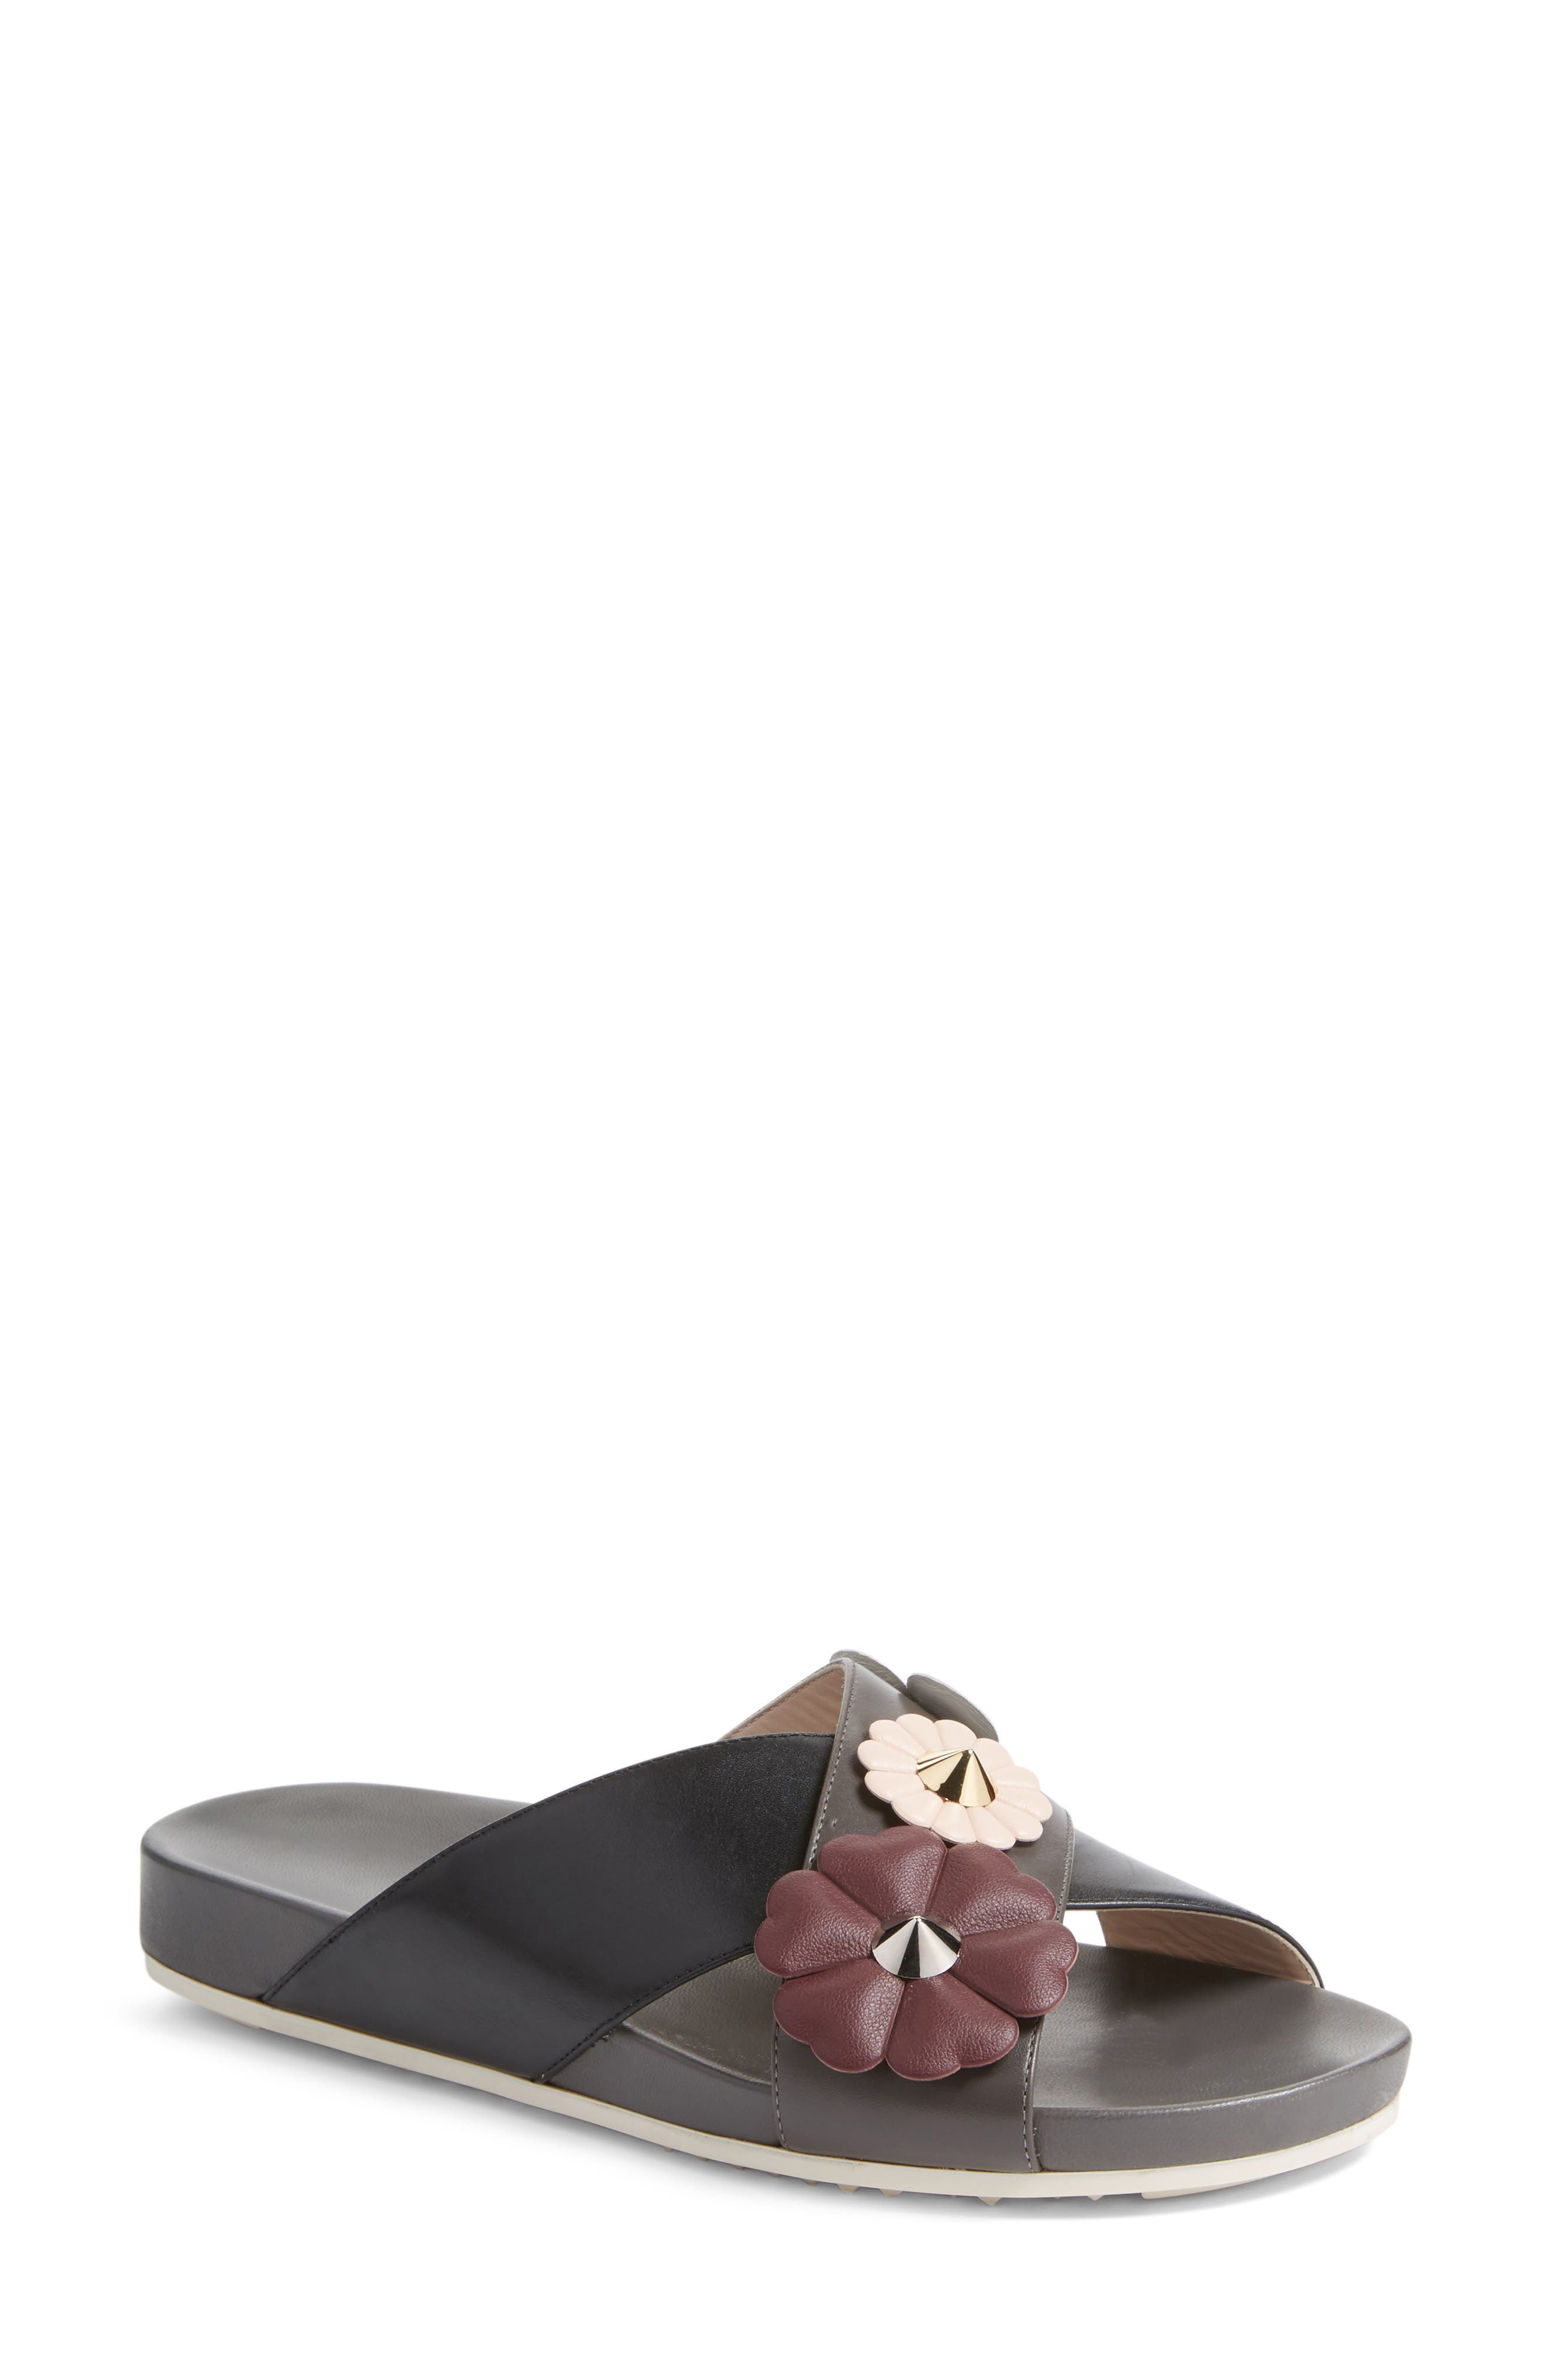 Flowerland Slide Sandal,                             Main thumbnail 1, color,                             Black/ Purple